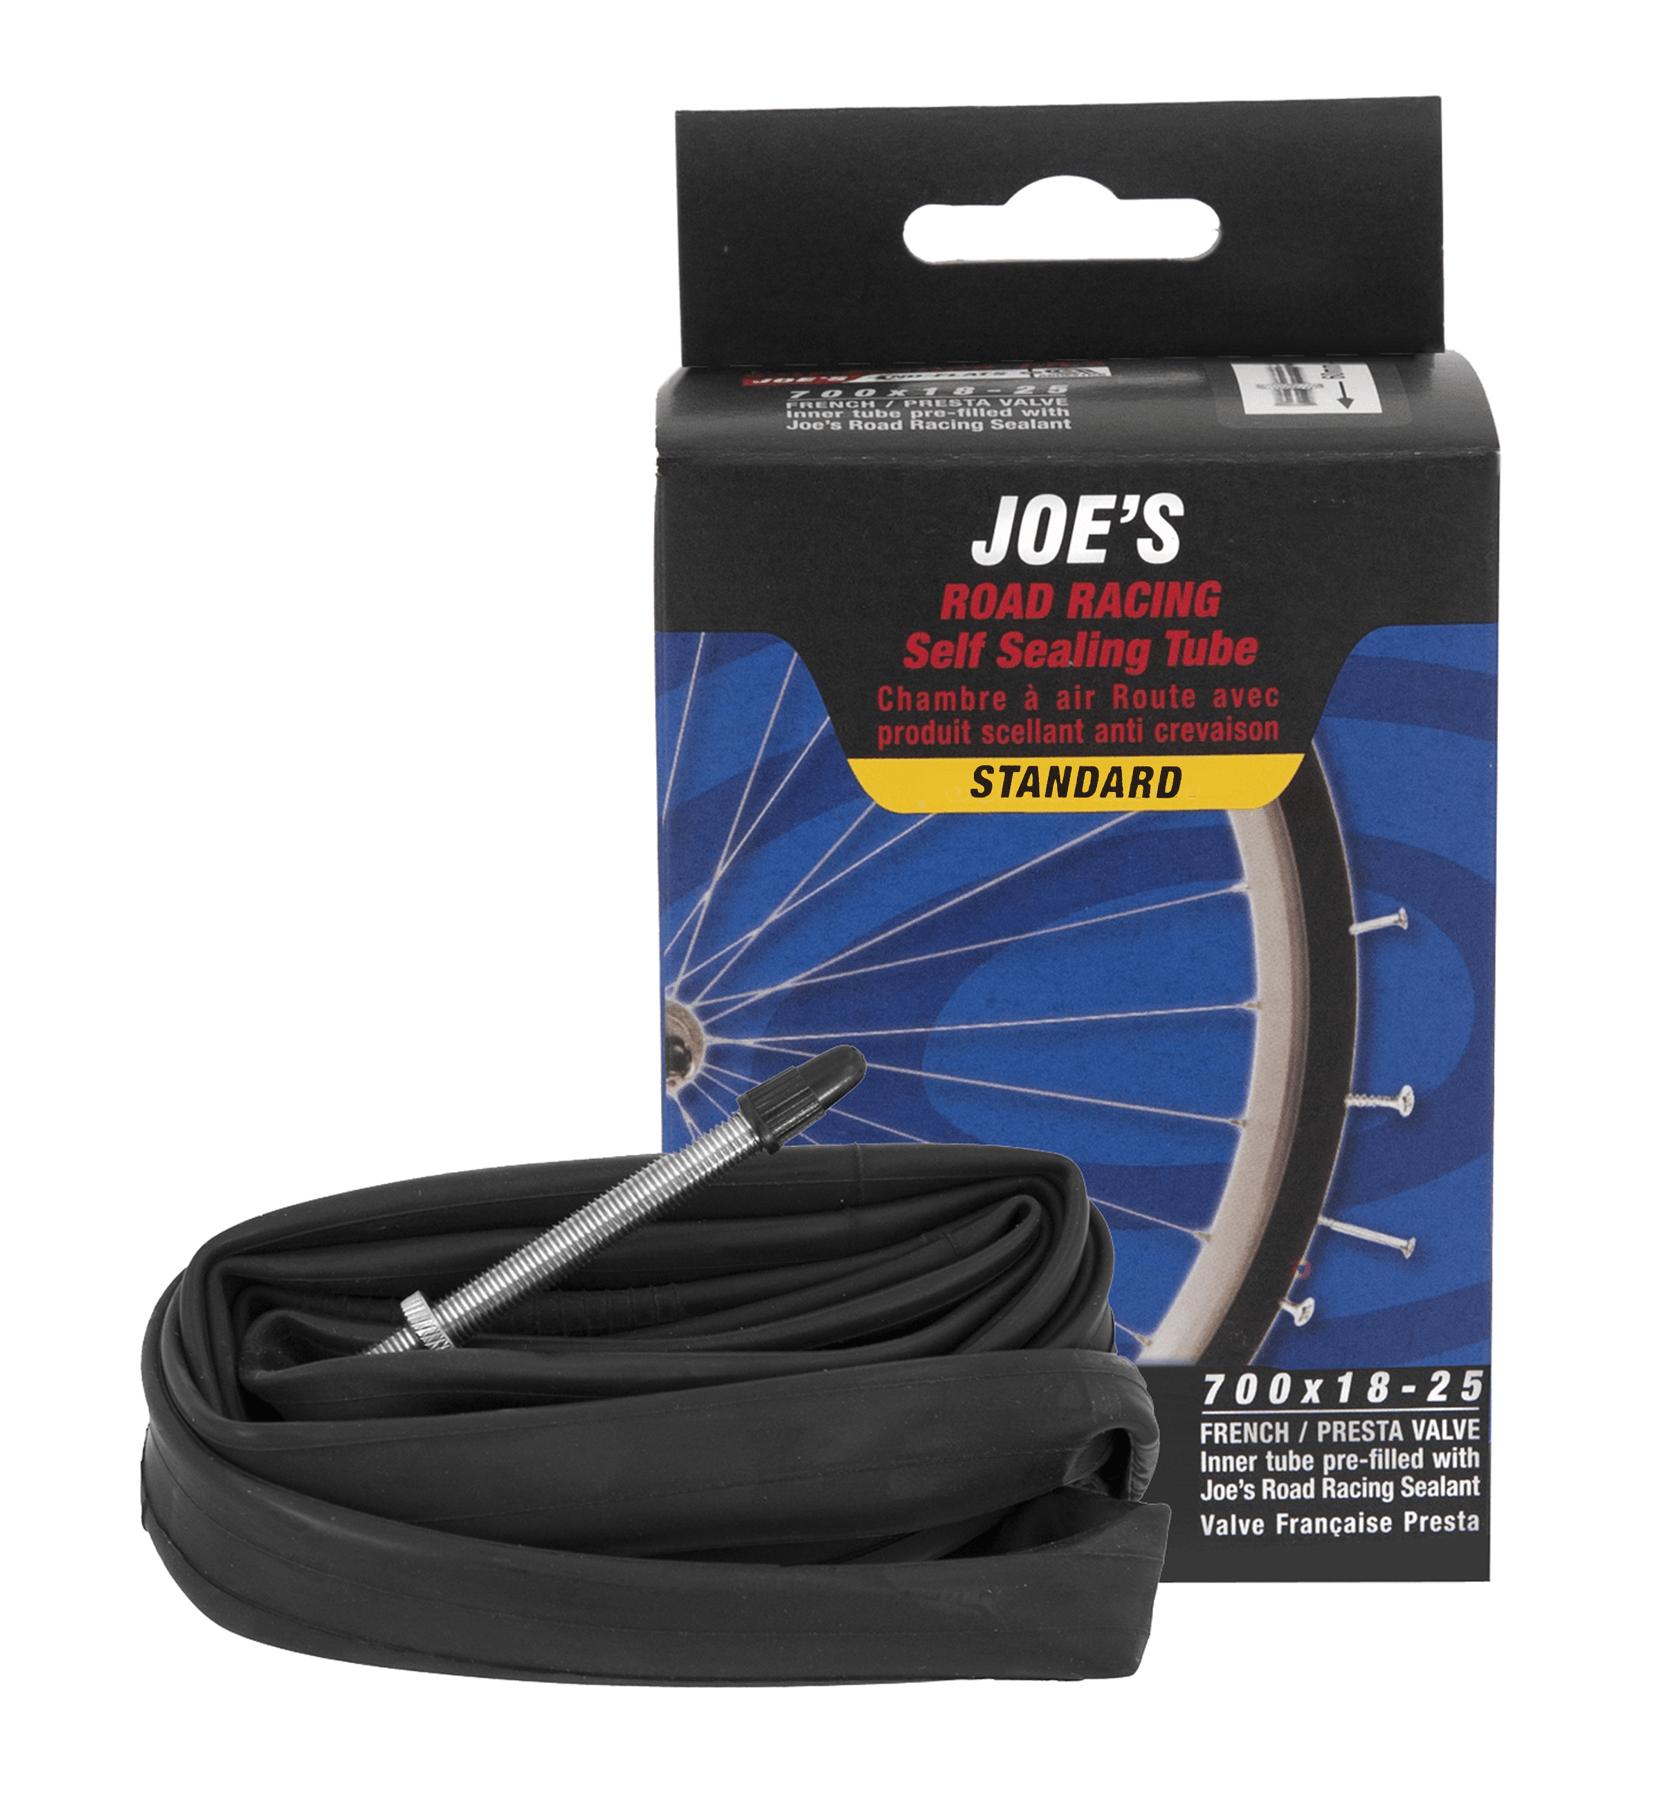 Joe's No Flats Slange med Super Sealant 700x18-25 Racer 60 MM   Tubes